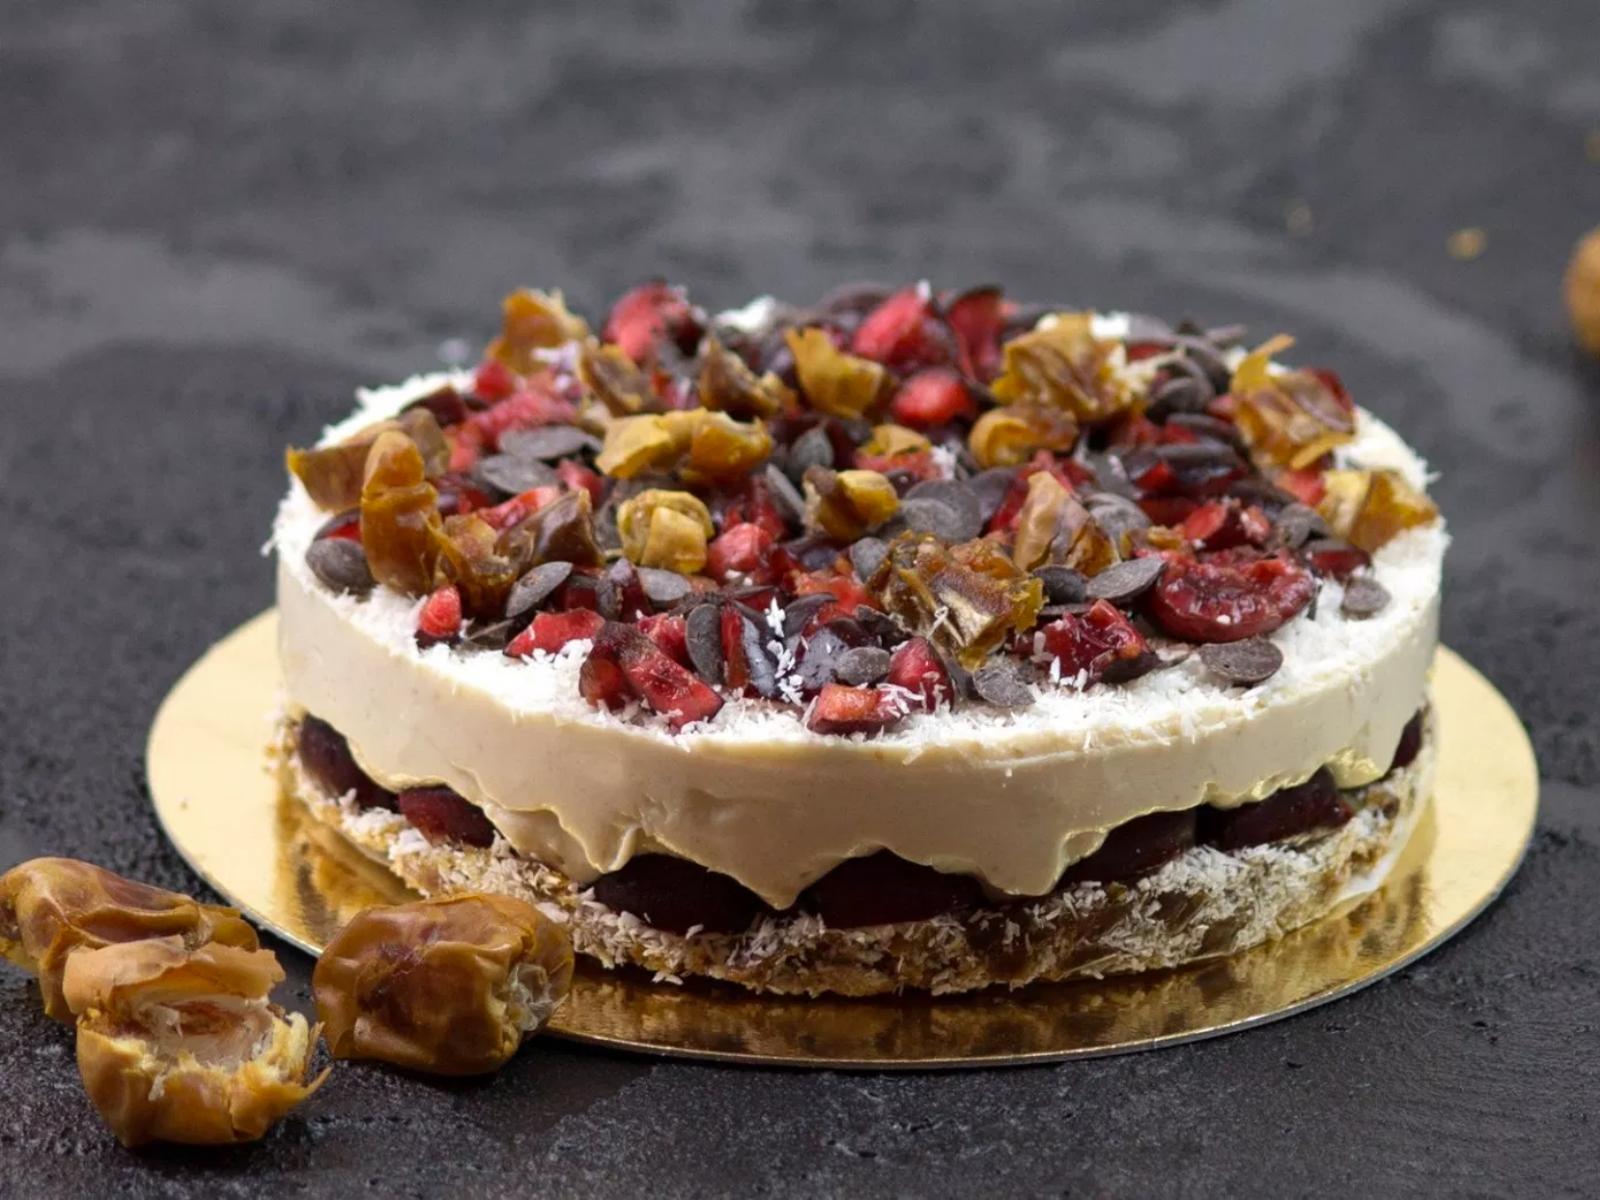 Vegan Coconut Cherry Cake Sweetened With Dates